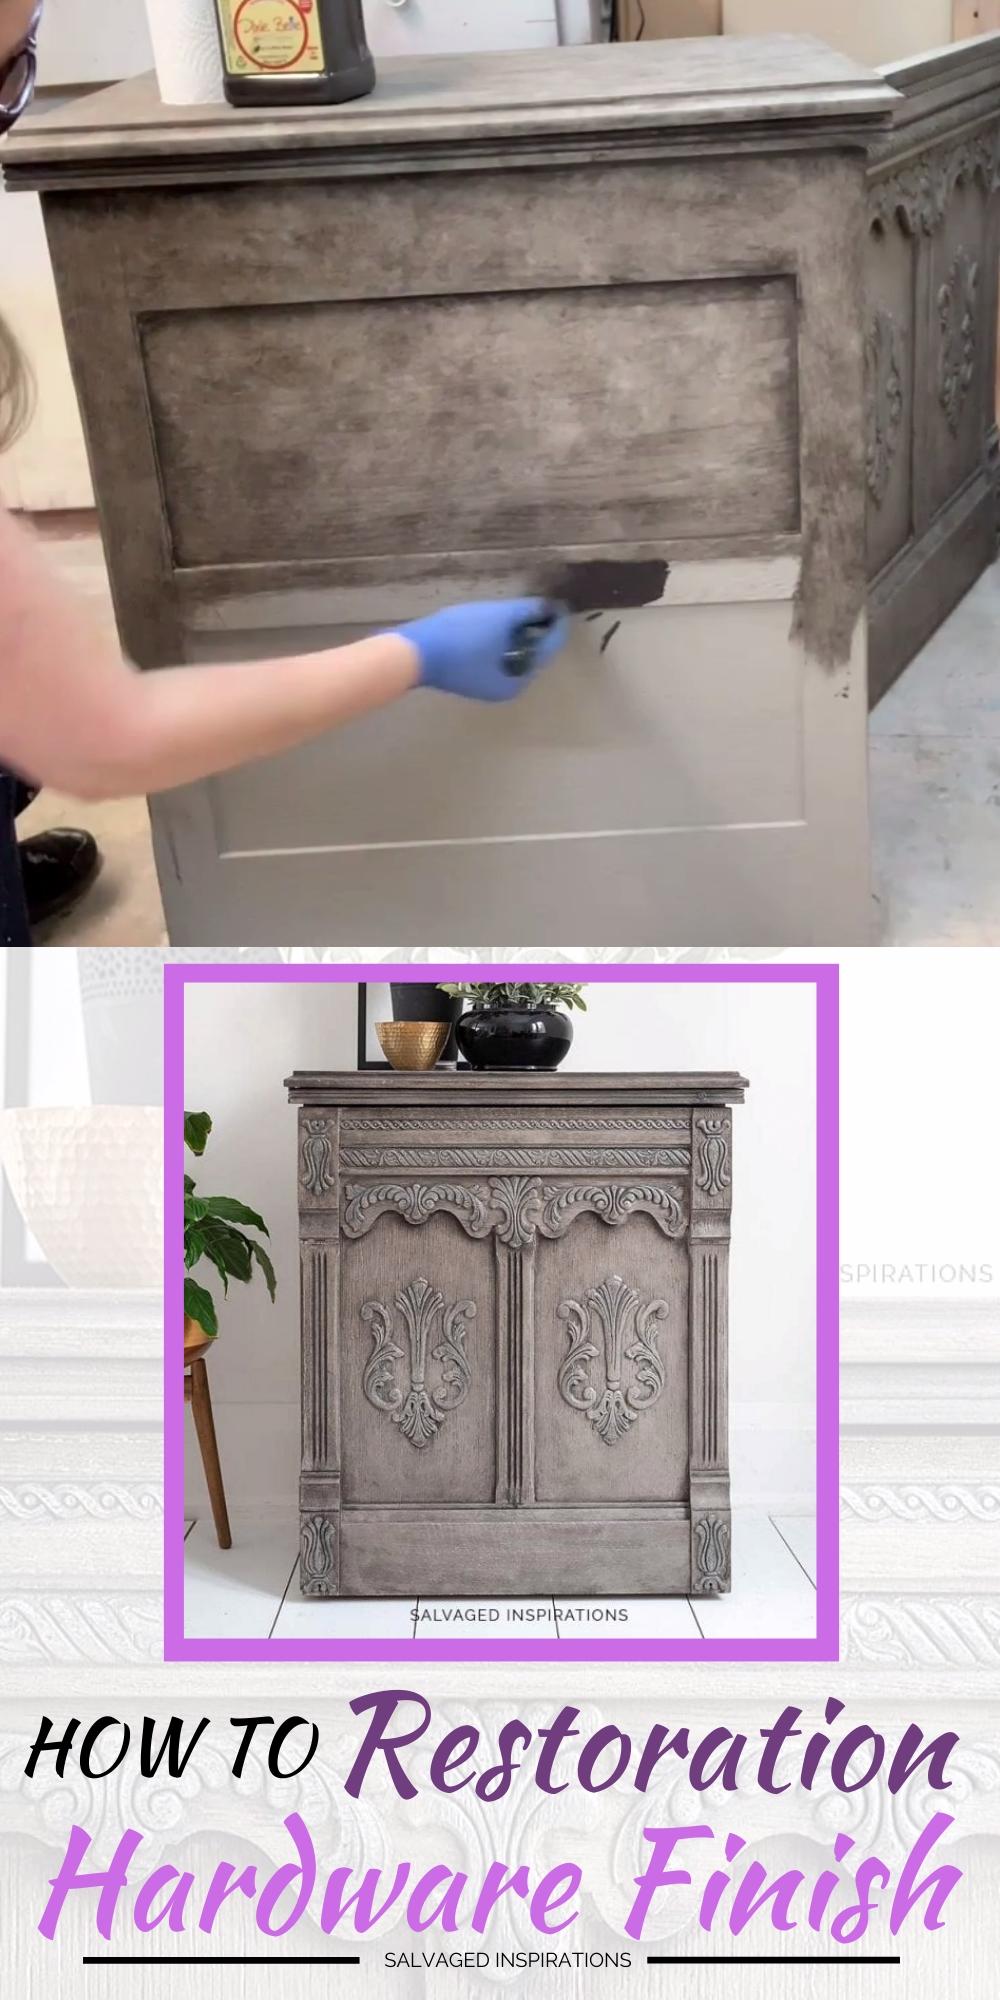 DIY Restoration Hardware Paint Finish